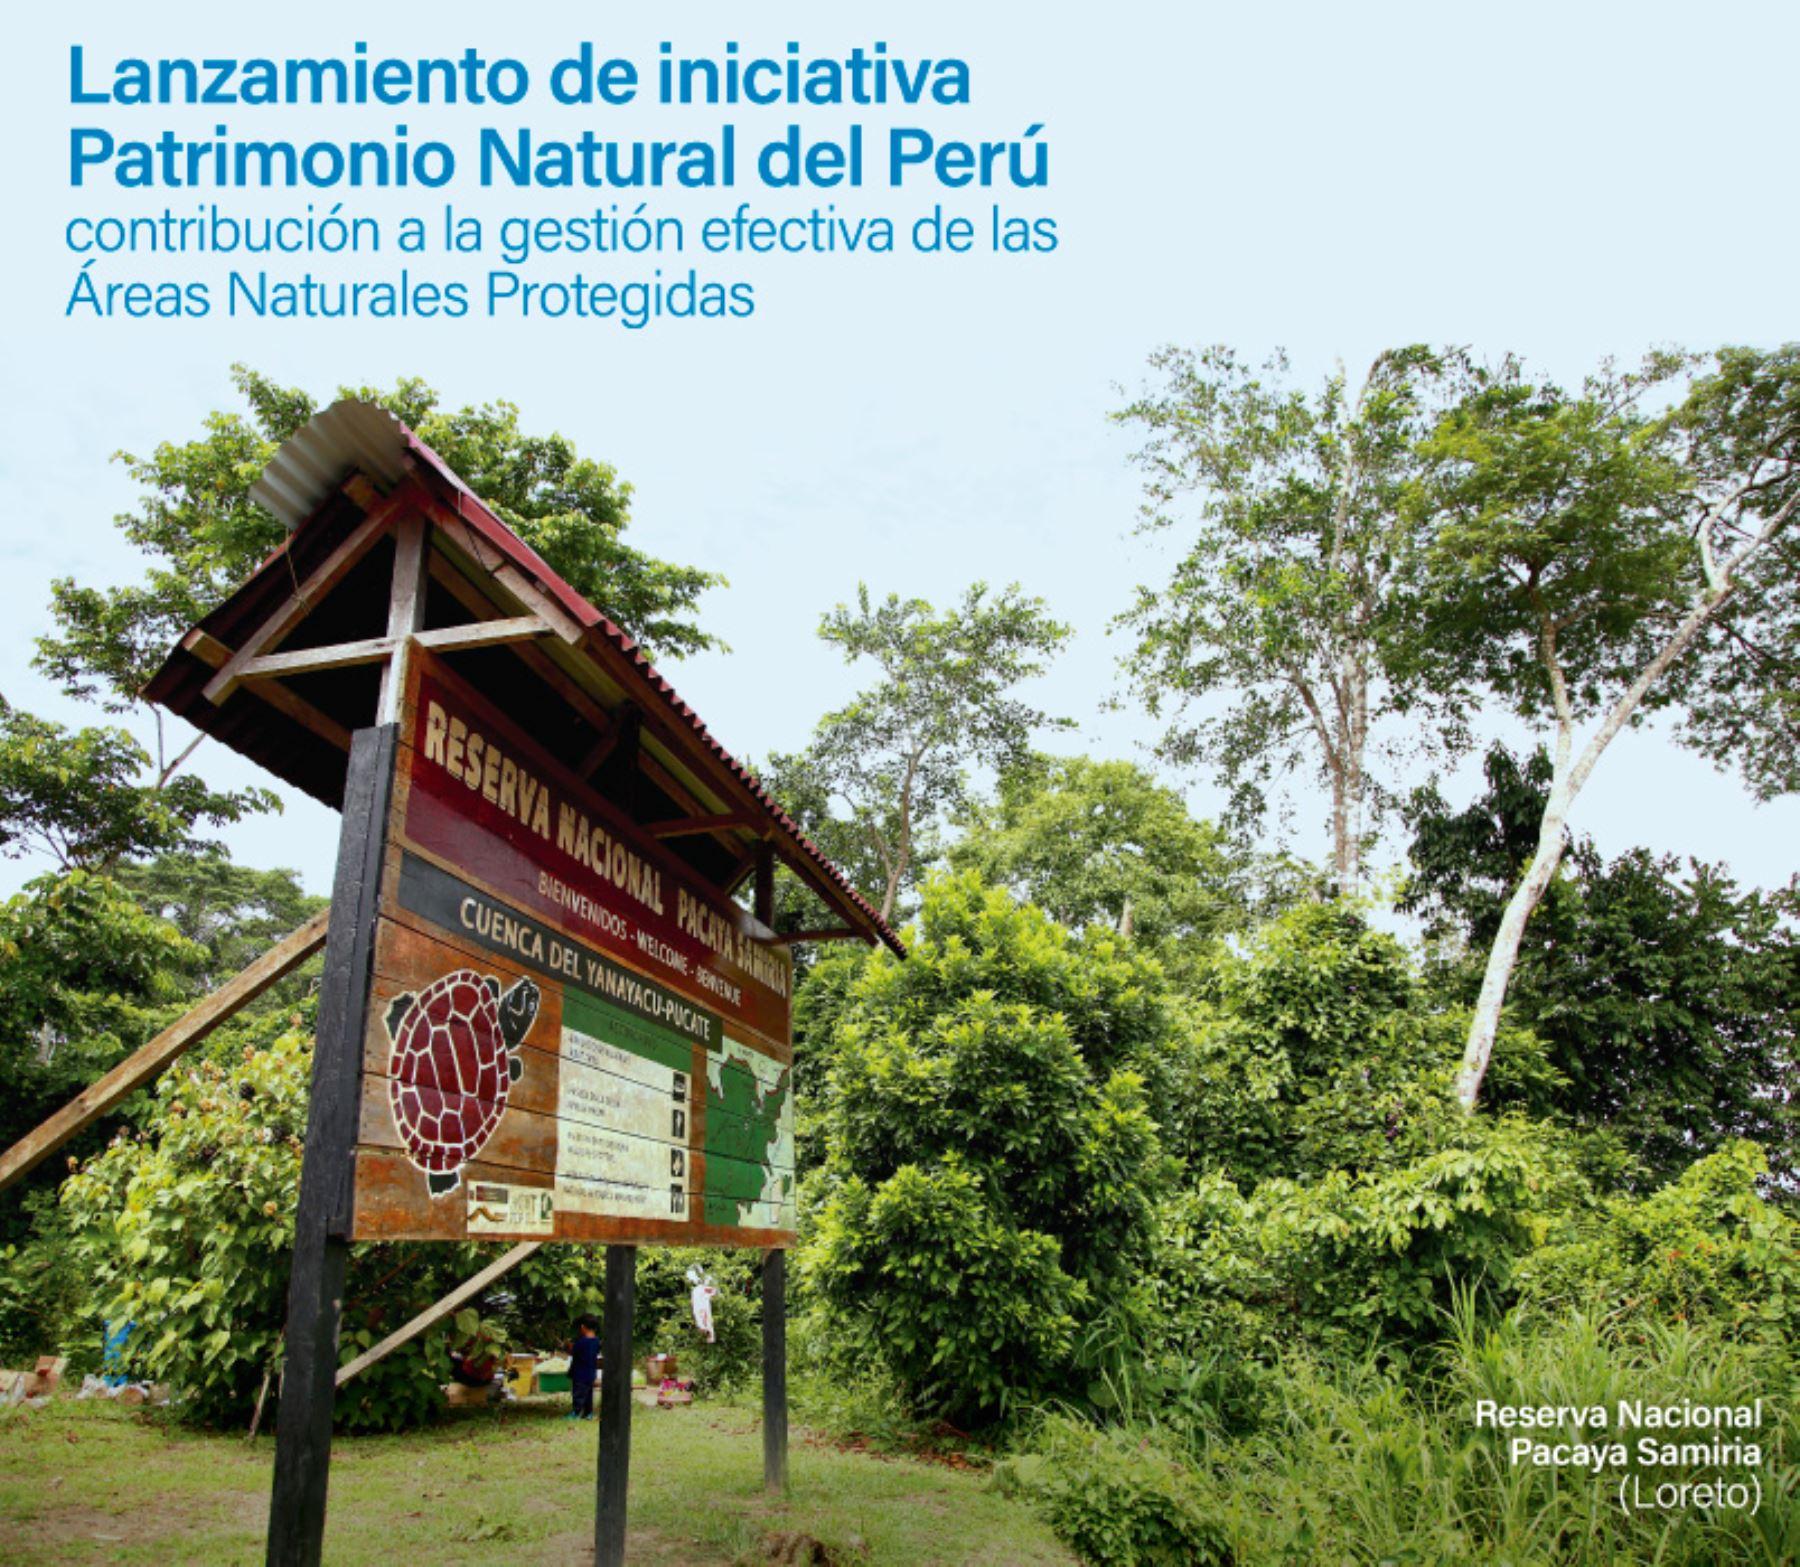 Iniciativa Patrimonio Natural del Perú del Ministerio del Ambiente